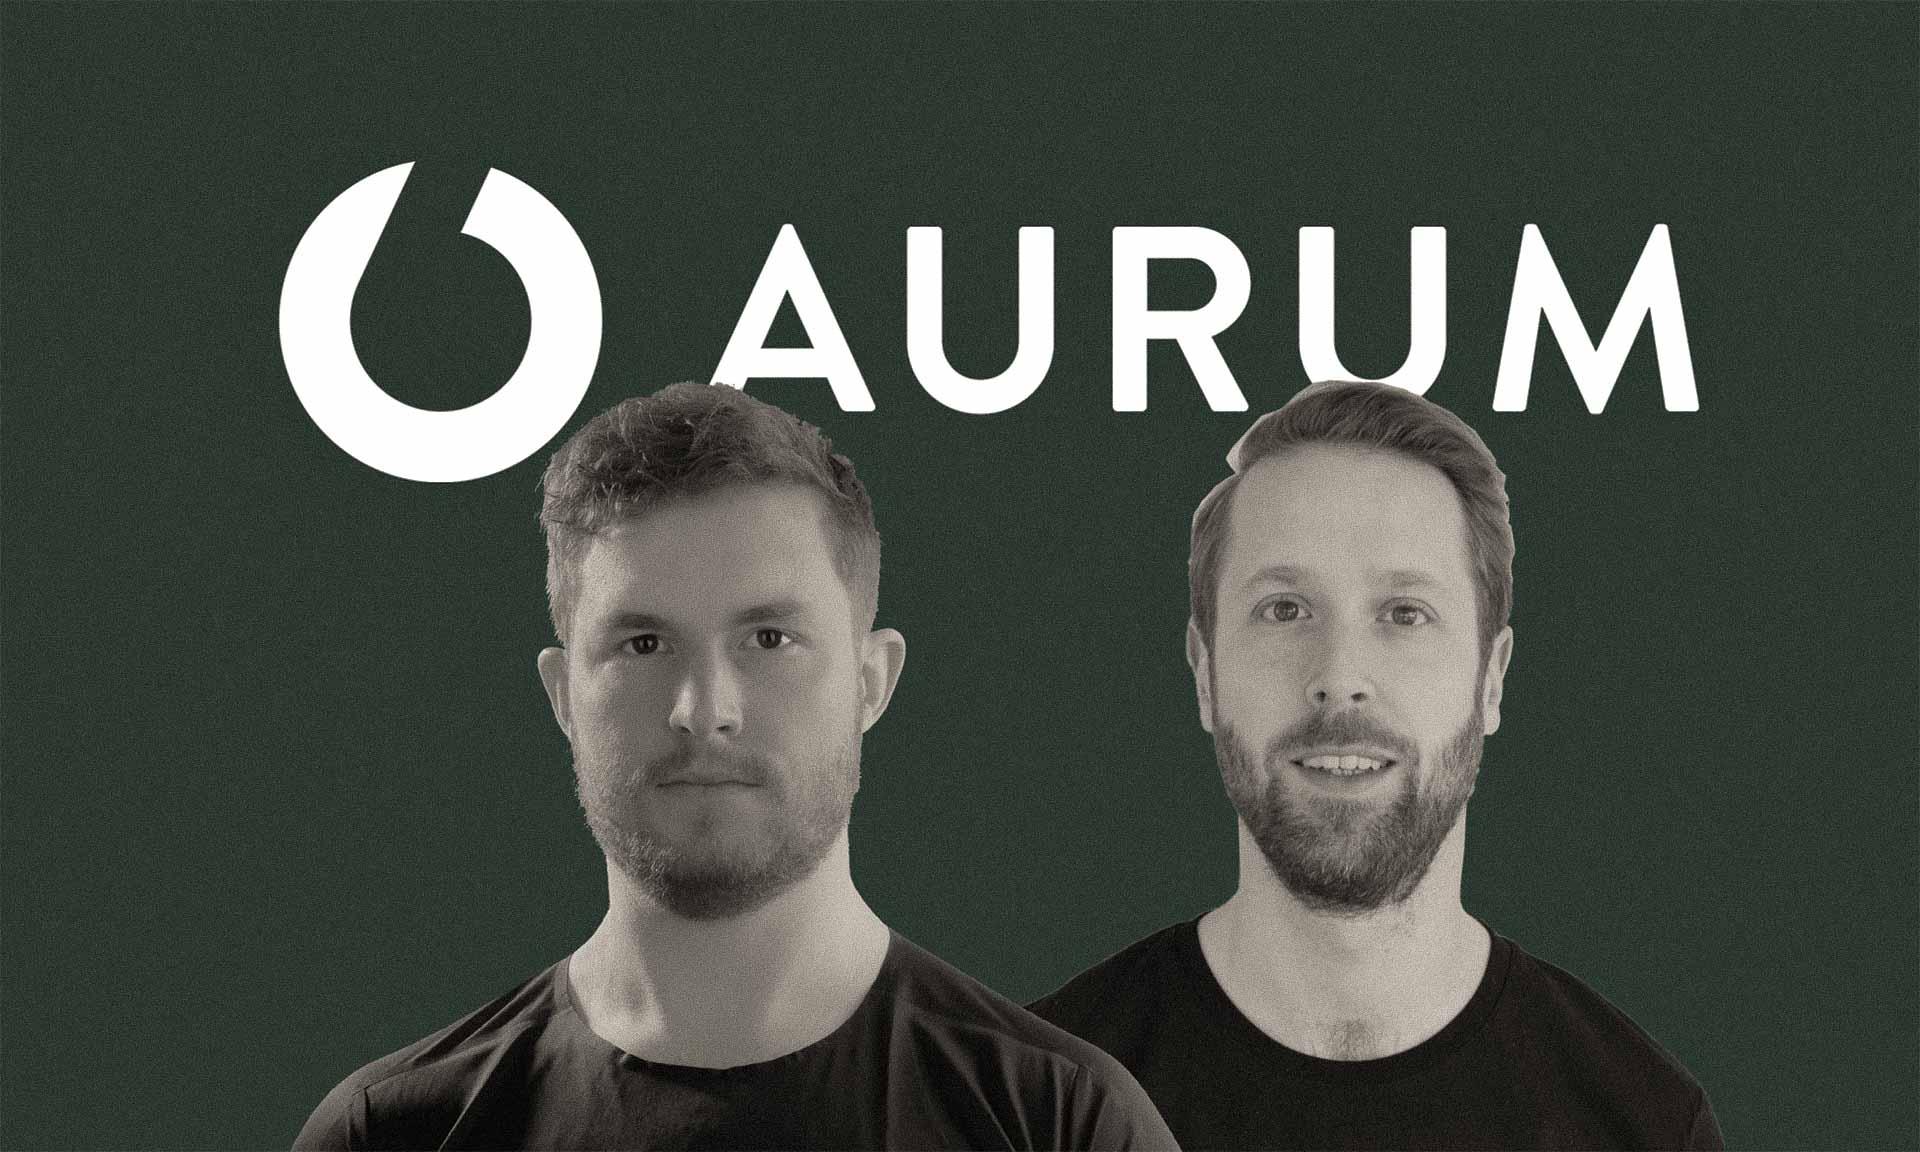 AURUM is high intensity strength training. Why? (Part 1/2)